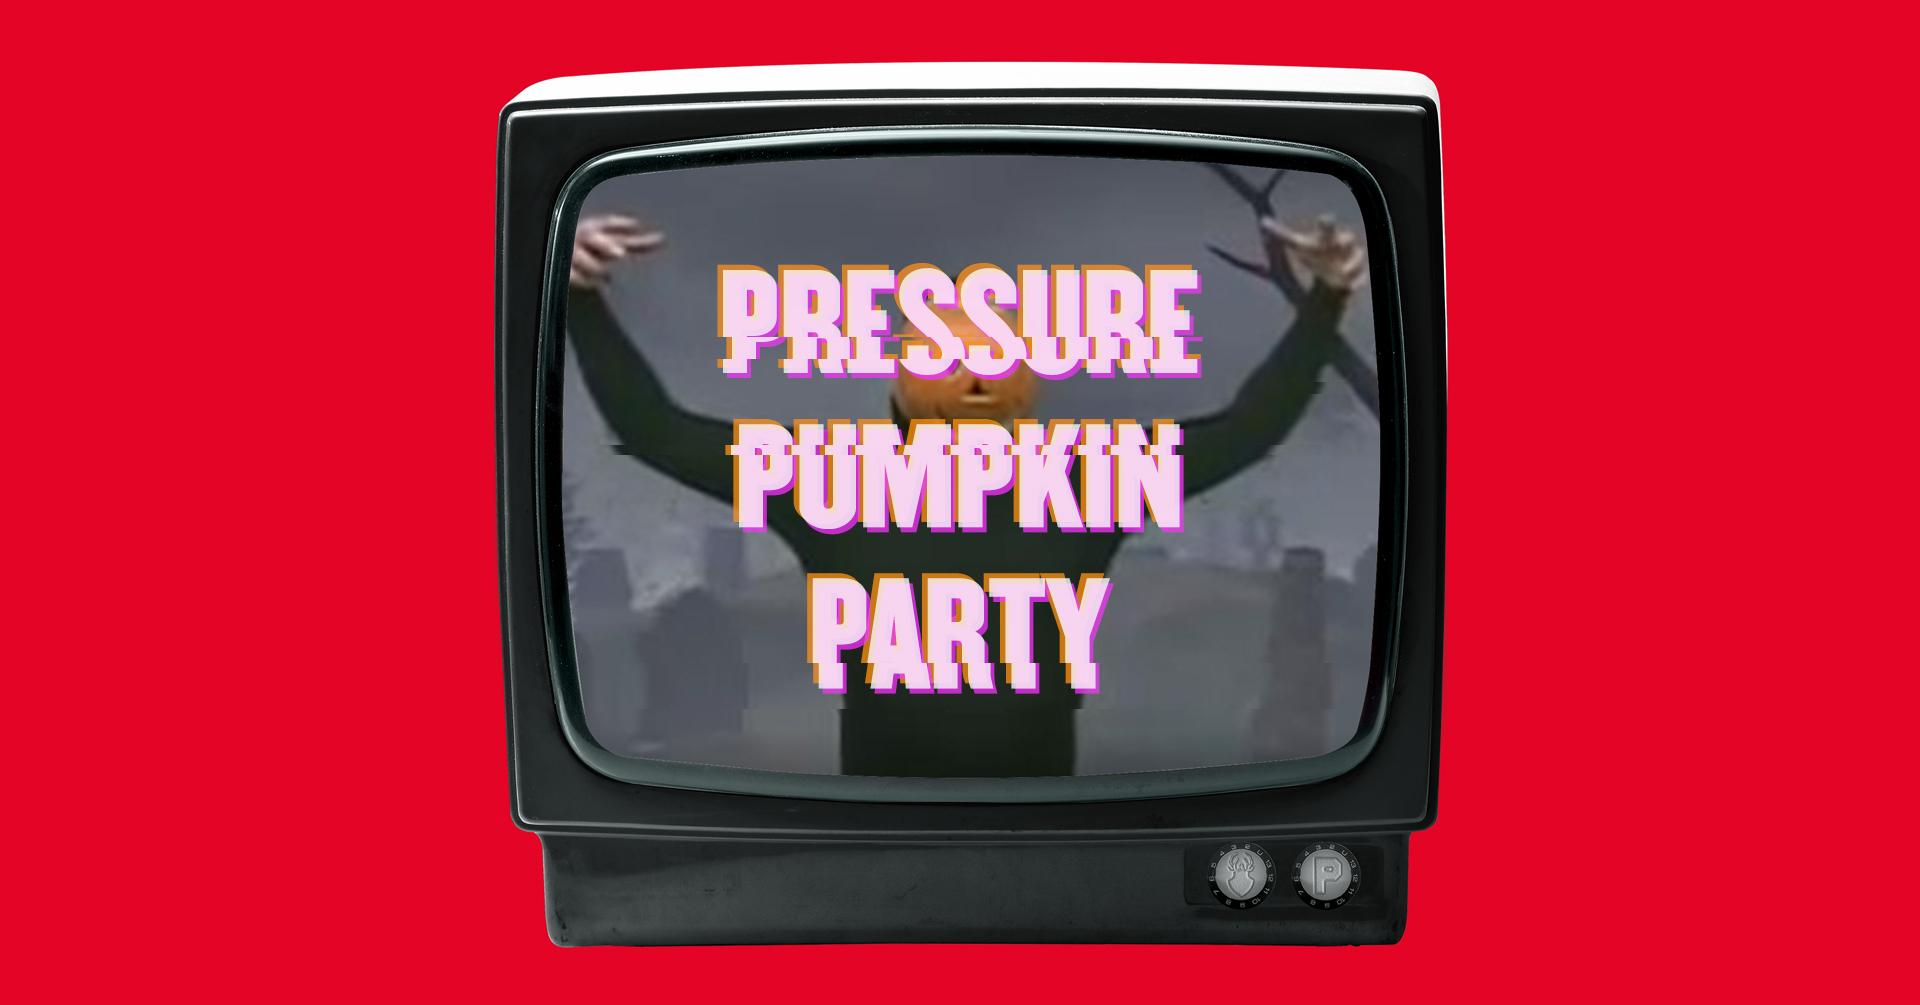 Pressure Halloween Party Thekla